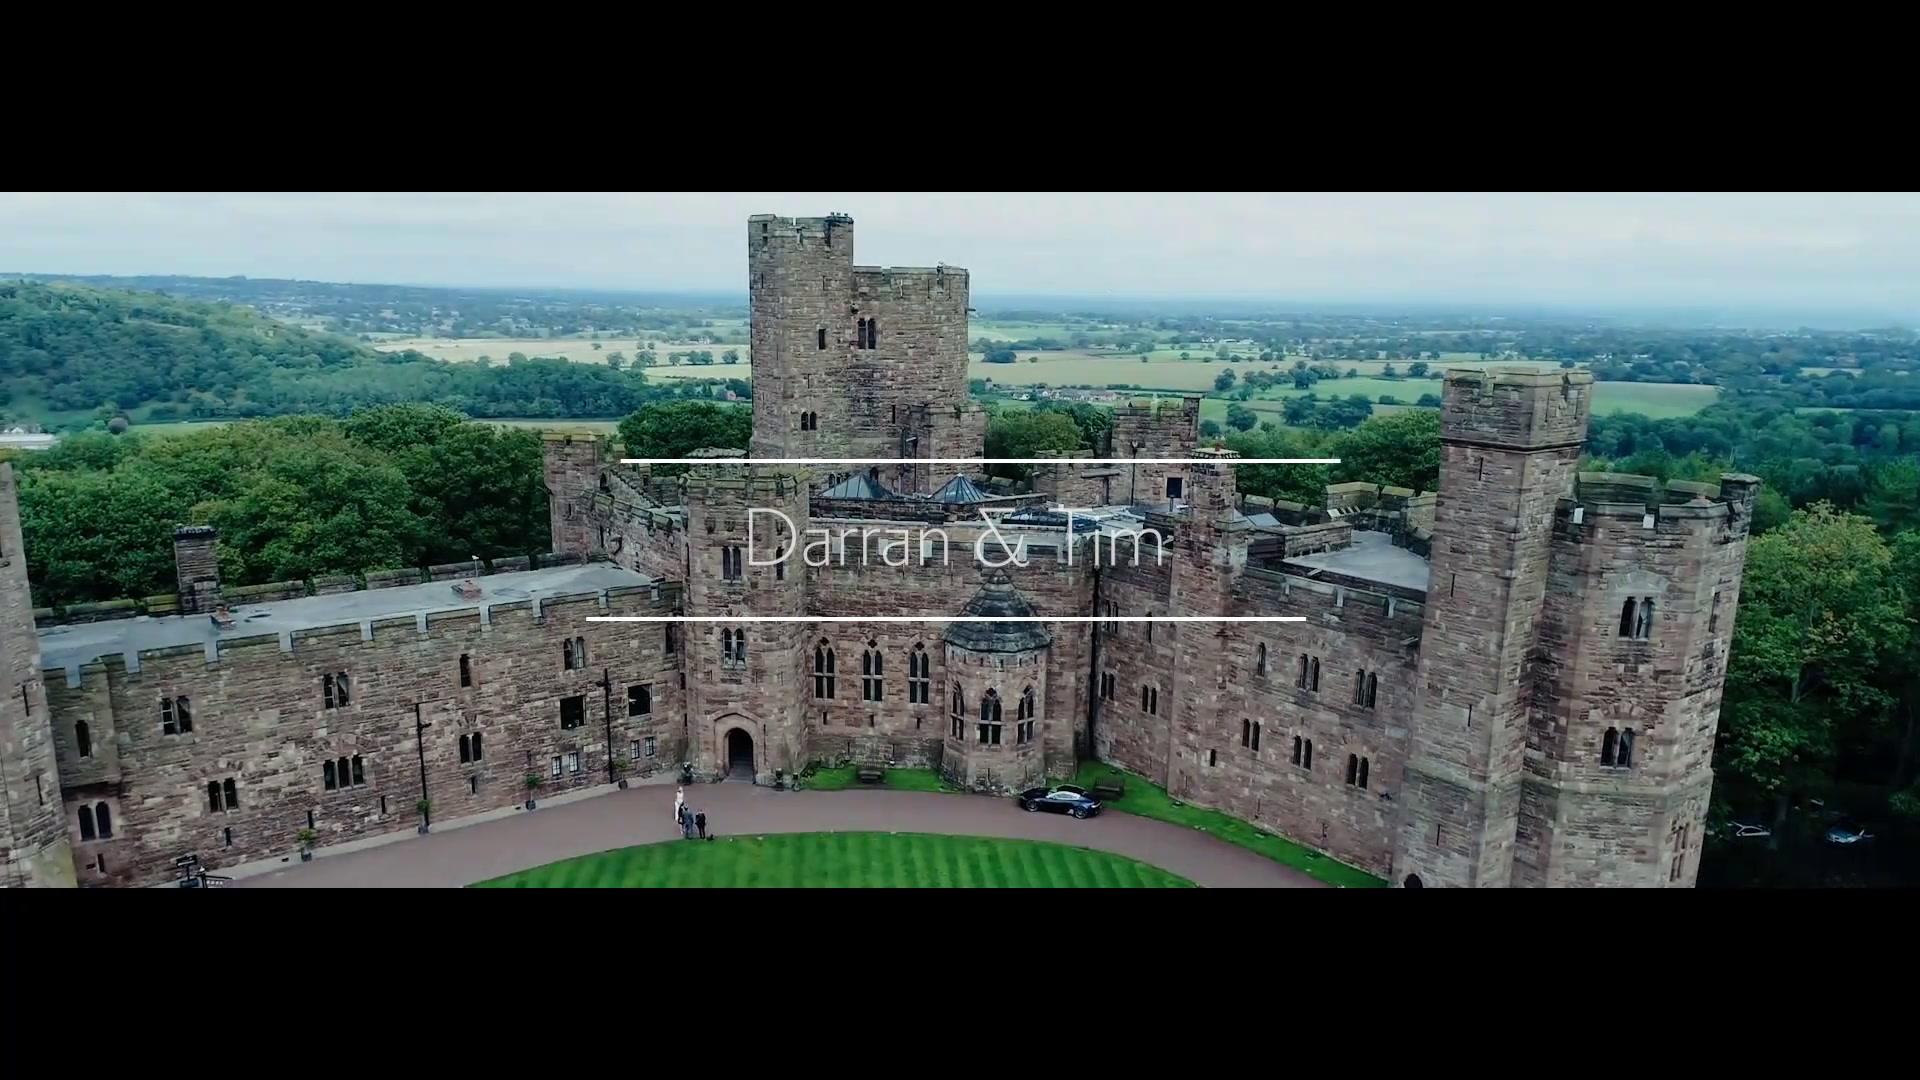 Darran + Tim | Tarporley, United Kingdom | Peckforton Castle